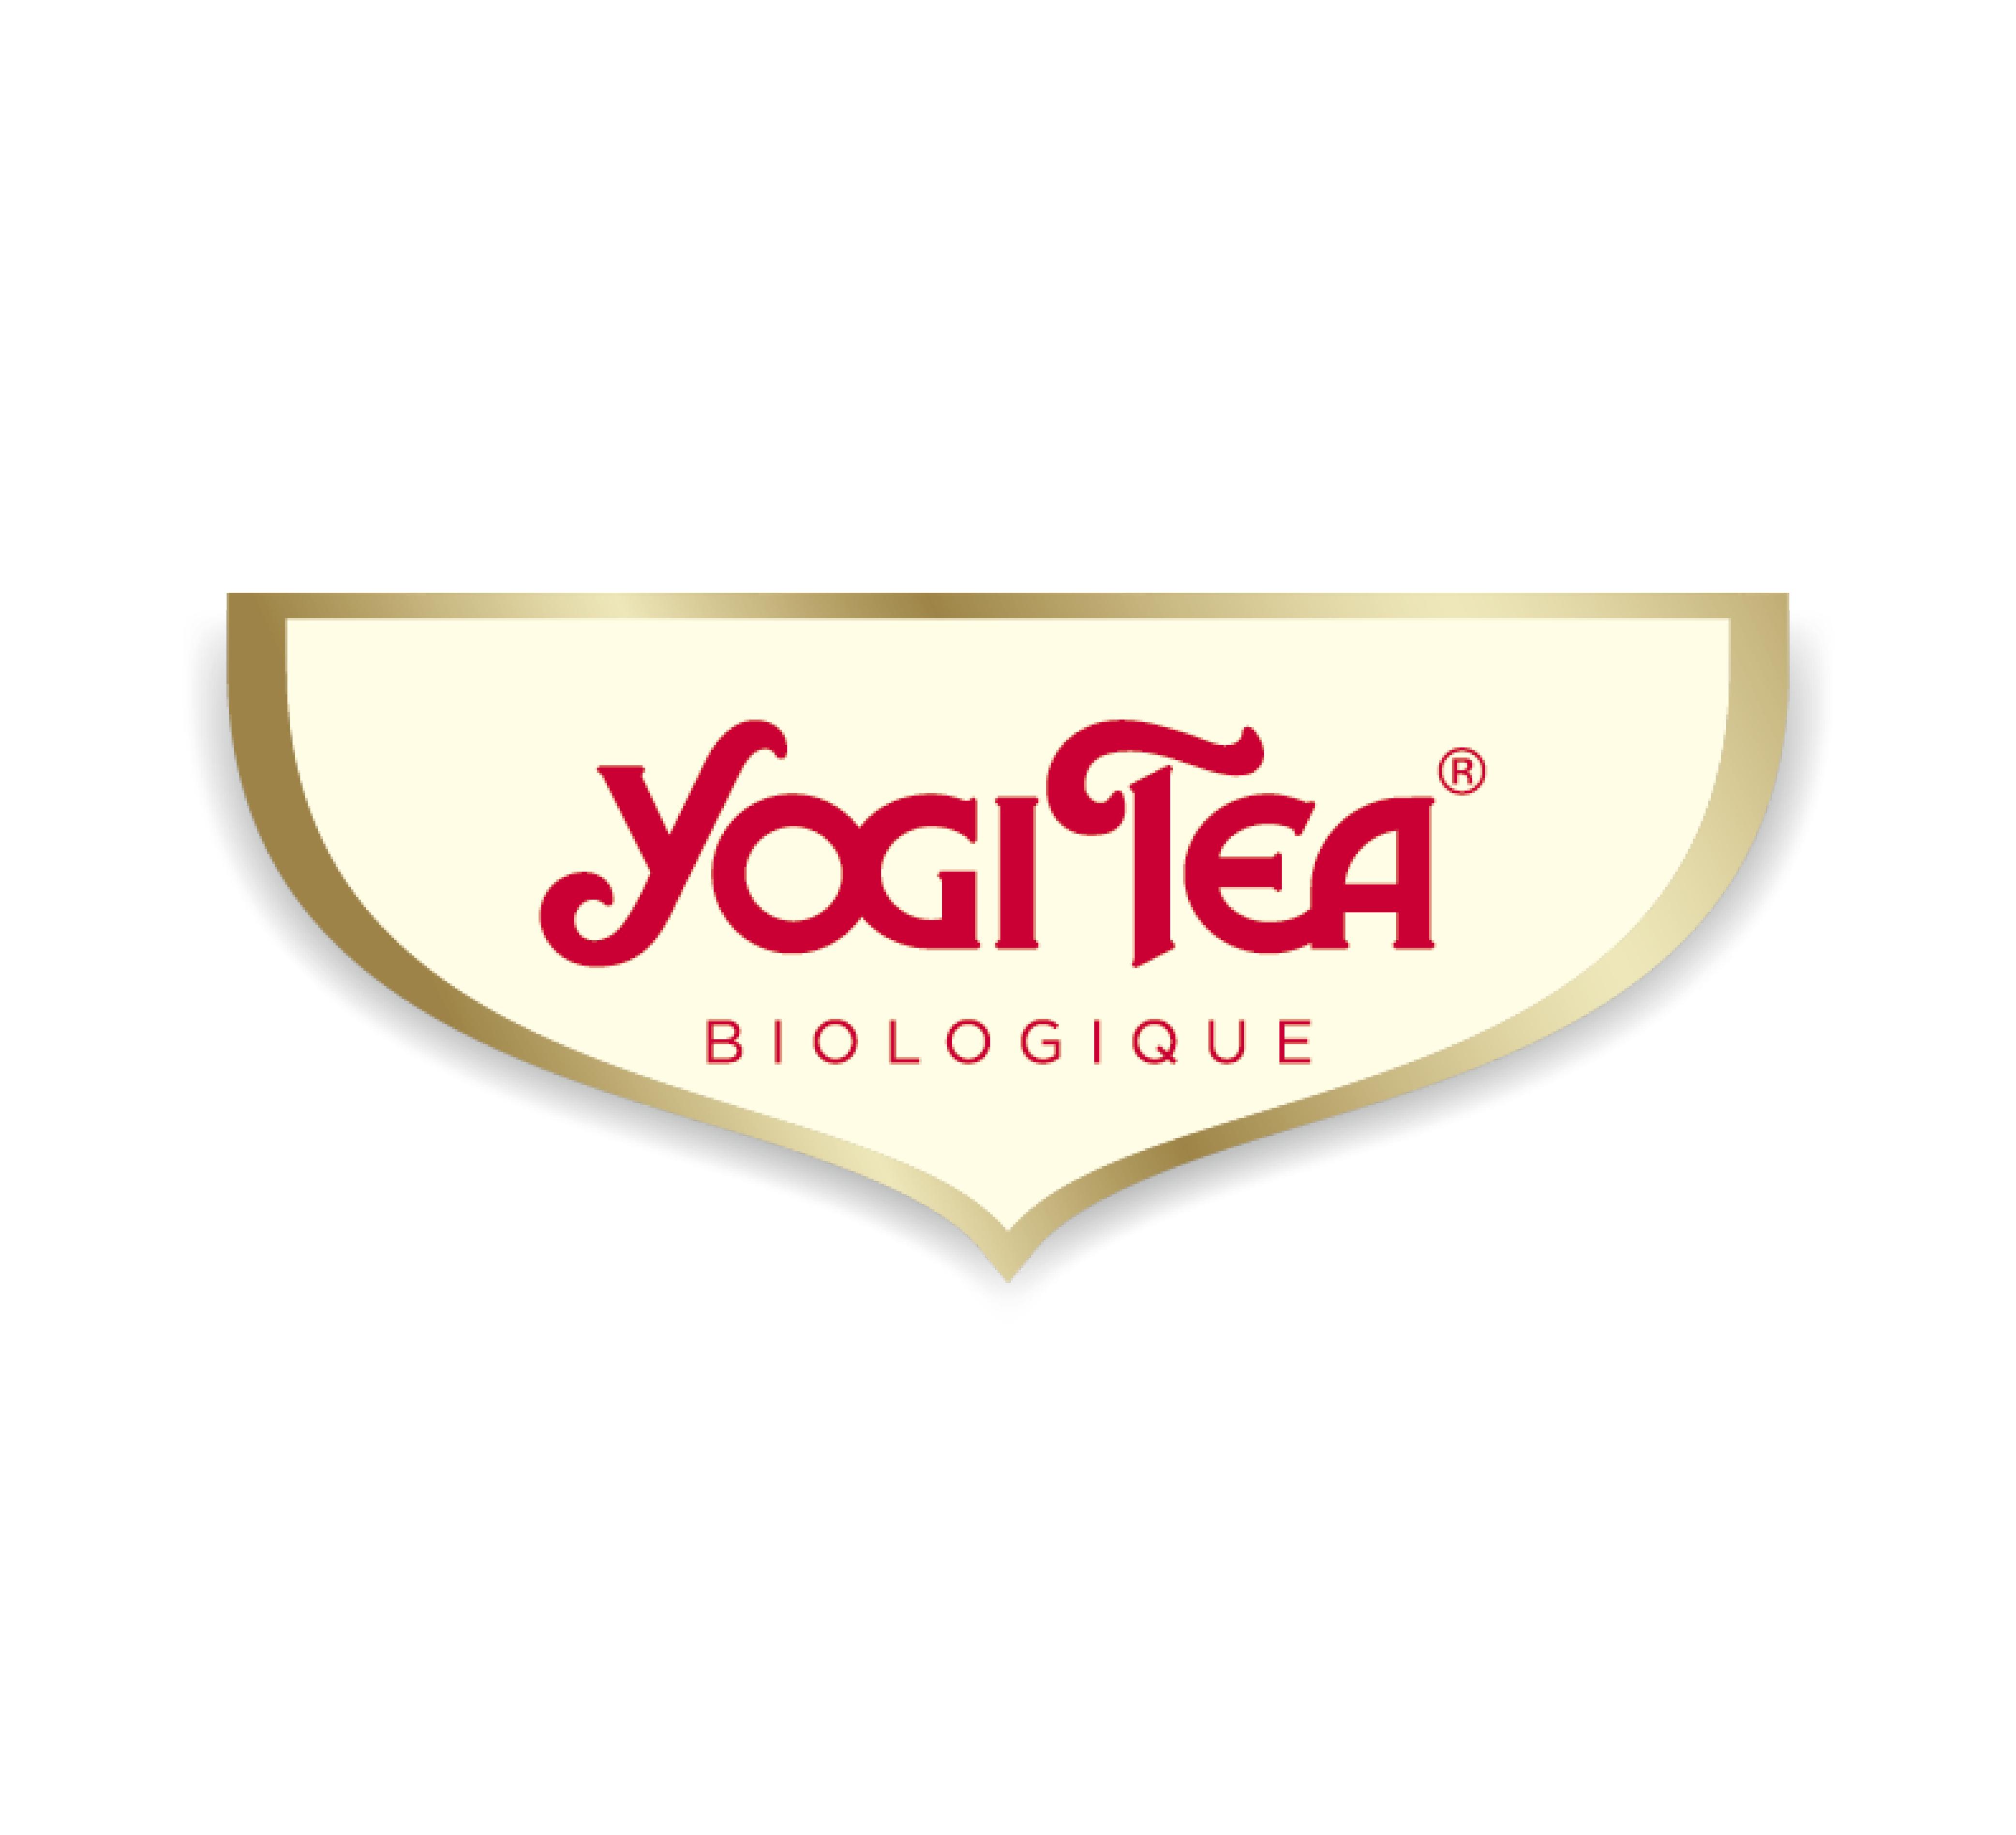 YOGI TEA - SOUTIEN DU LYON STREET FOOD FESTIVAL